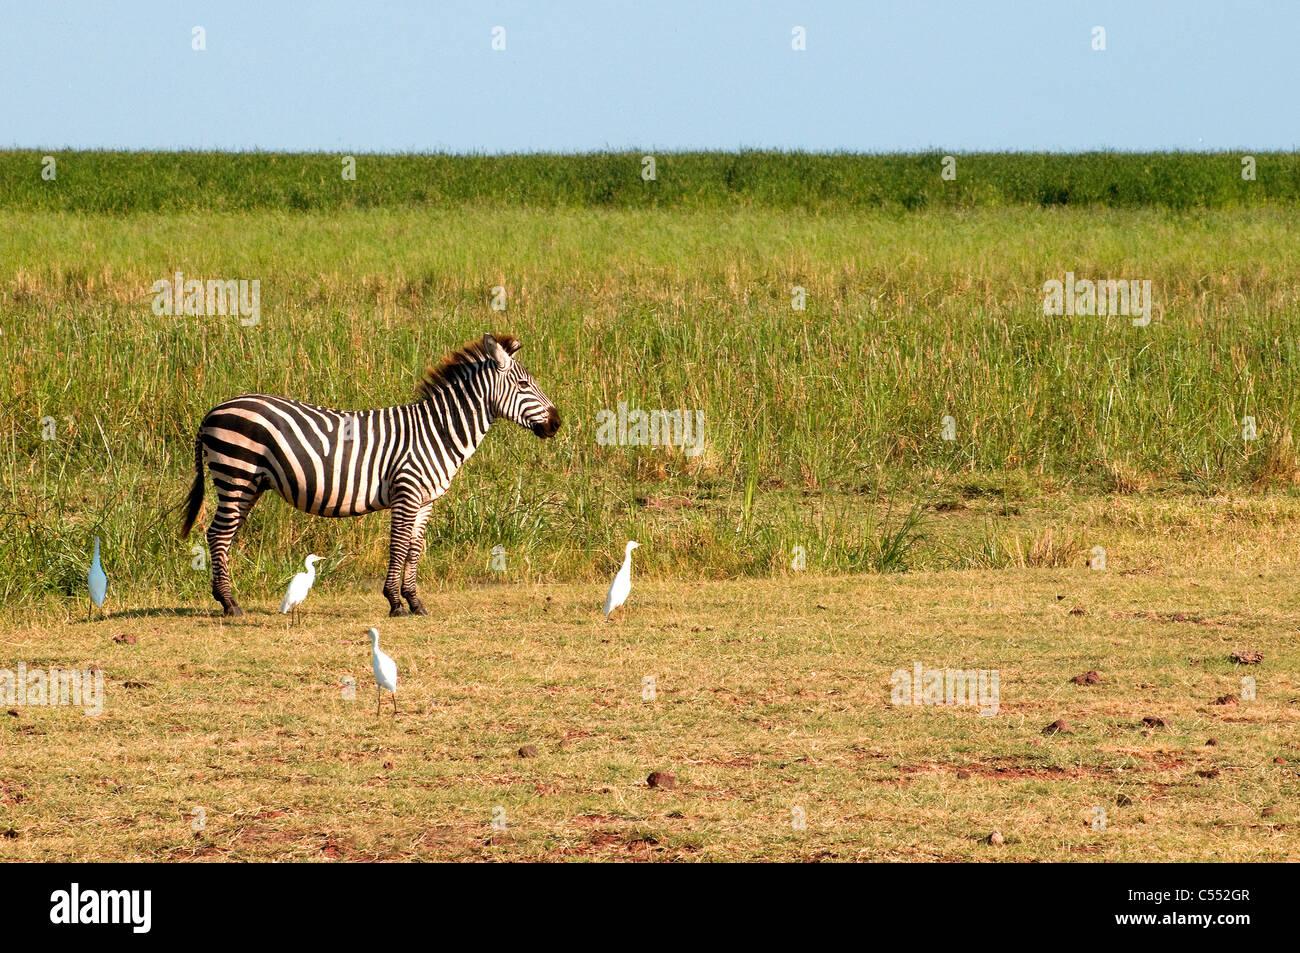 Zebra standing in a field, Lake Manyara National Park, Tanzania Stock Photo